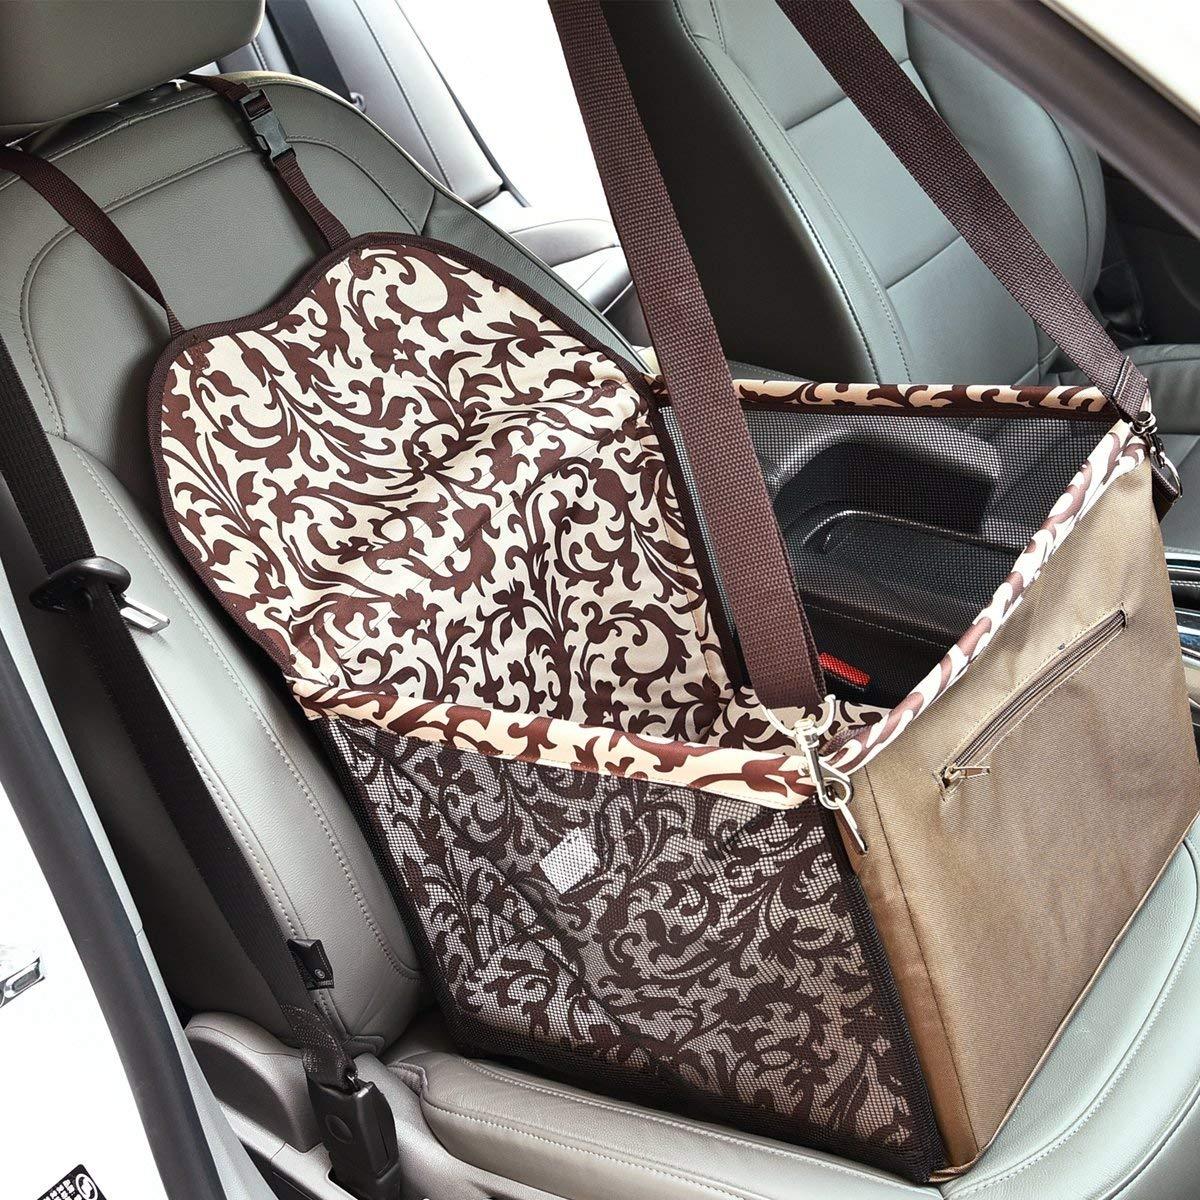 Buy Shjnhan Seat Cover Portable Folding Non Slip Pads